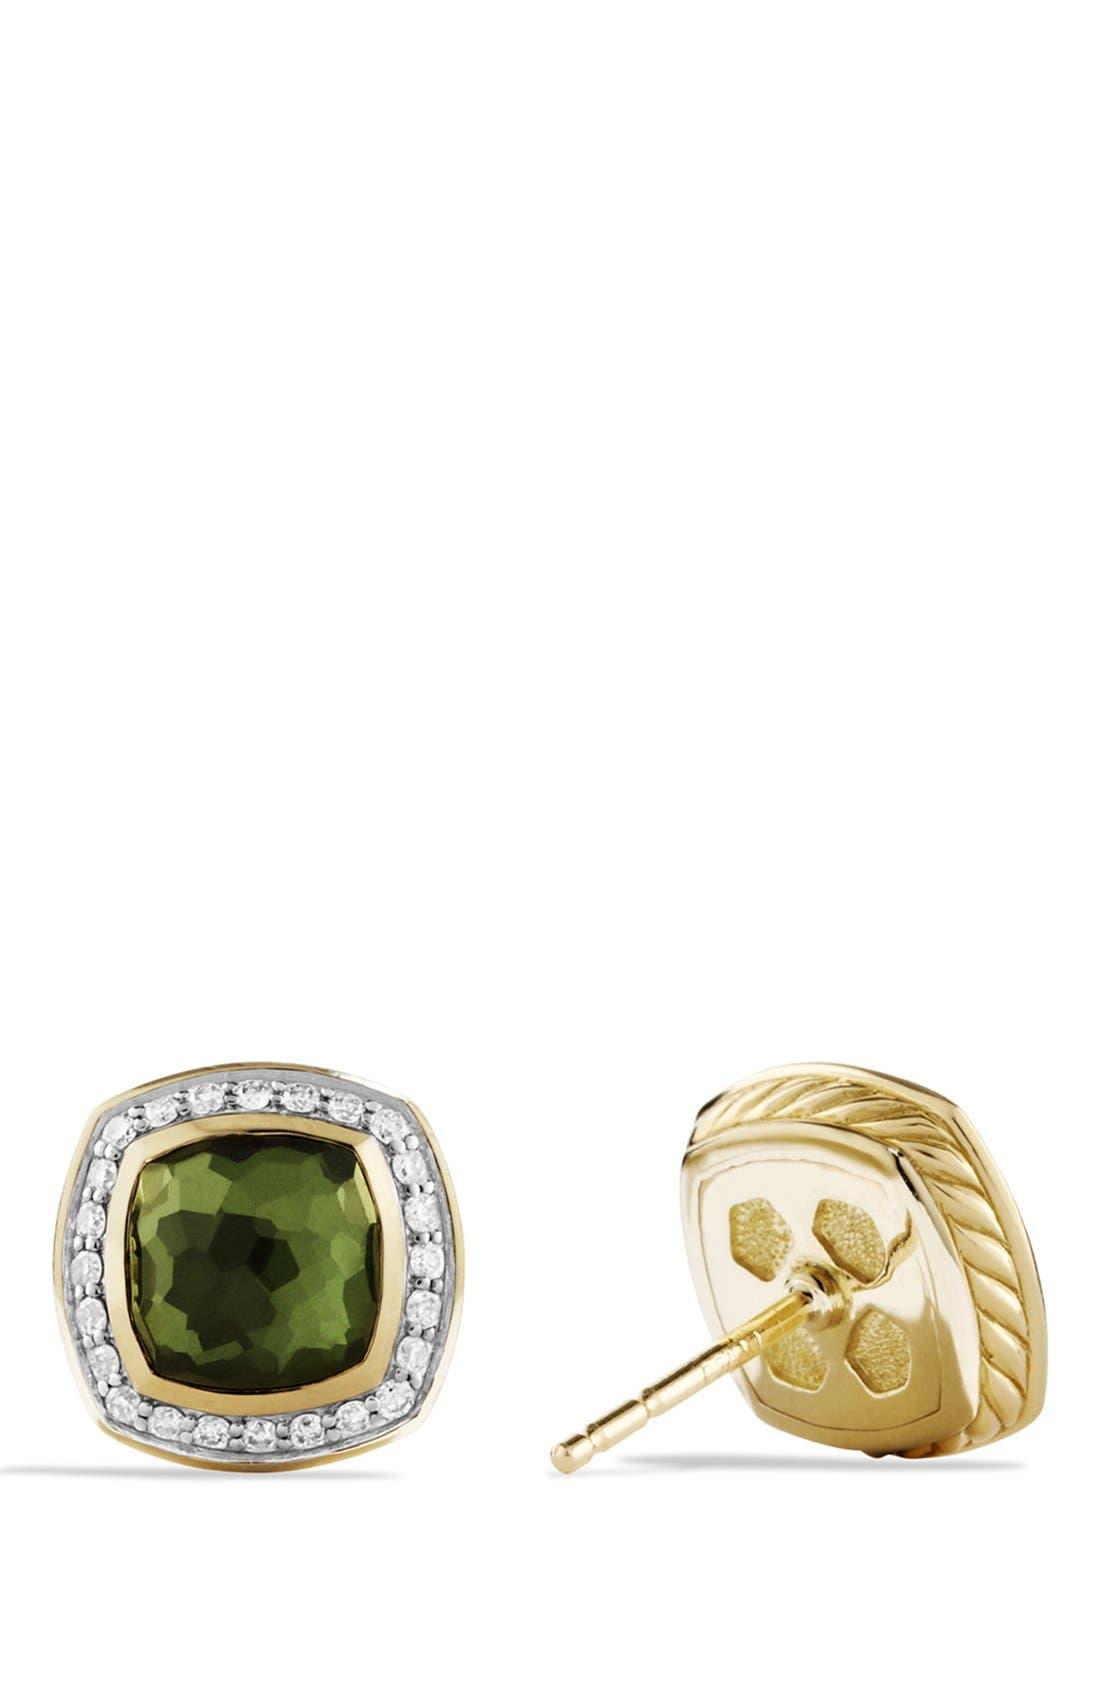 Alternate Image 2  - David Yurman 'Albion' Earrings with Semiprecious Stone and Diamonds in Gold